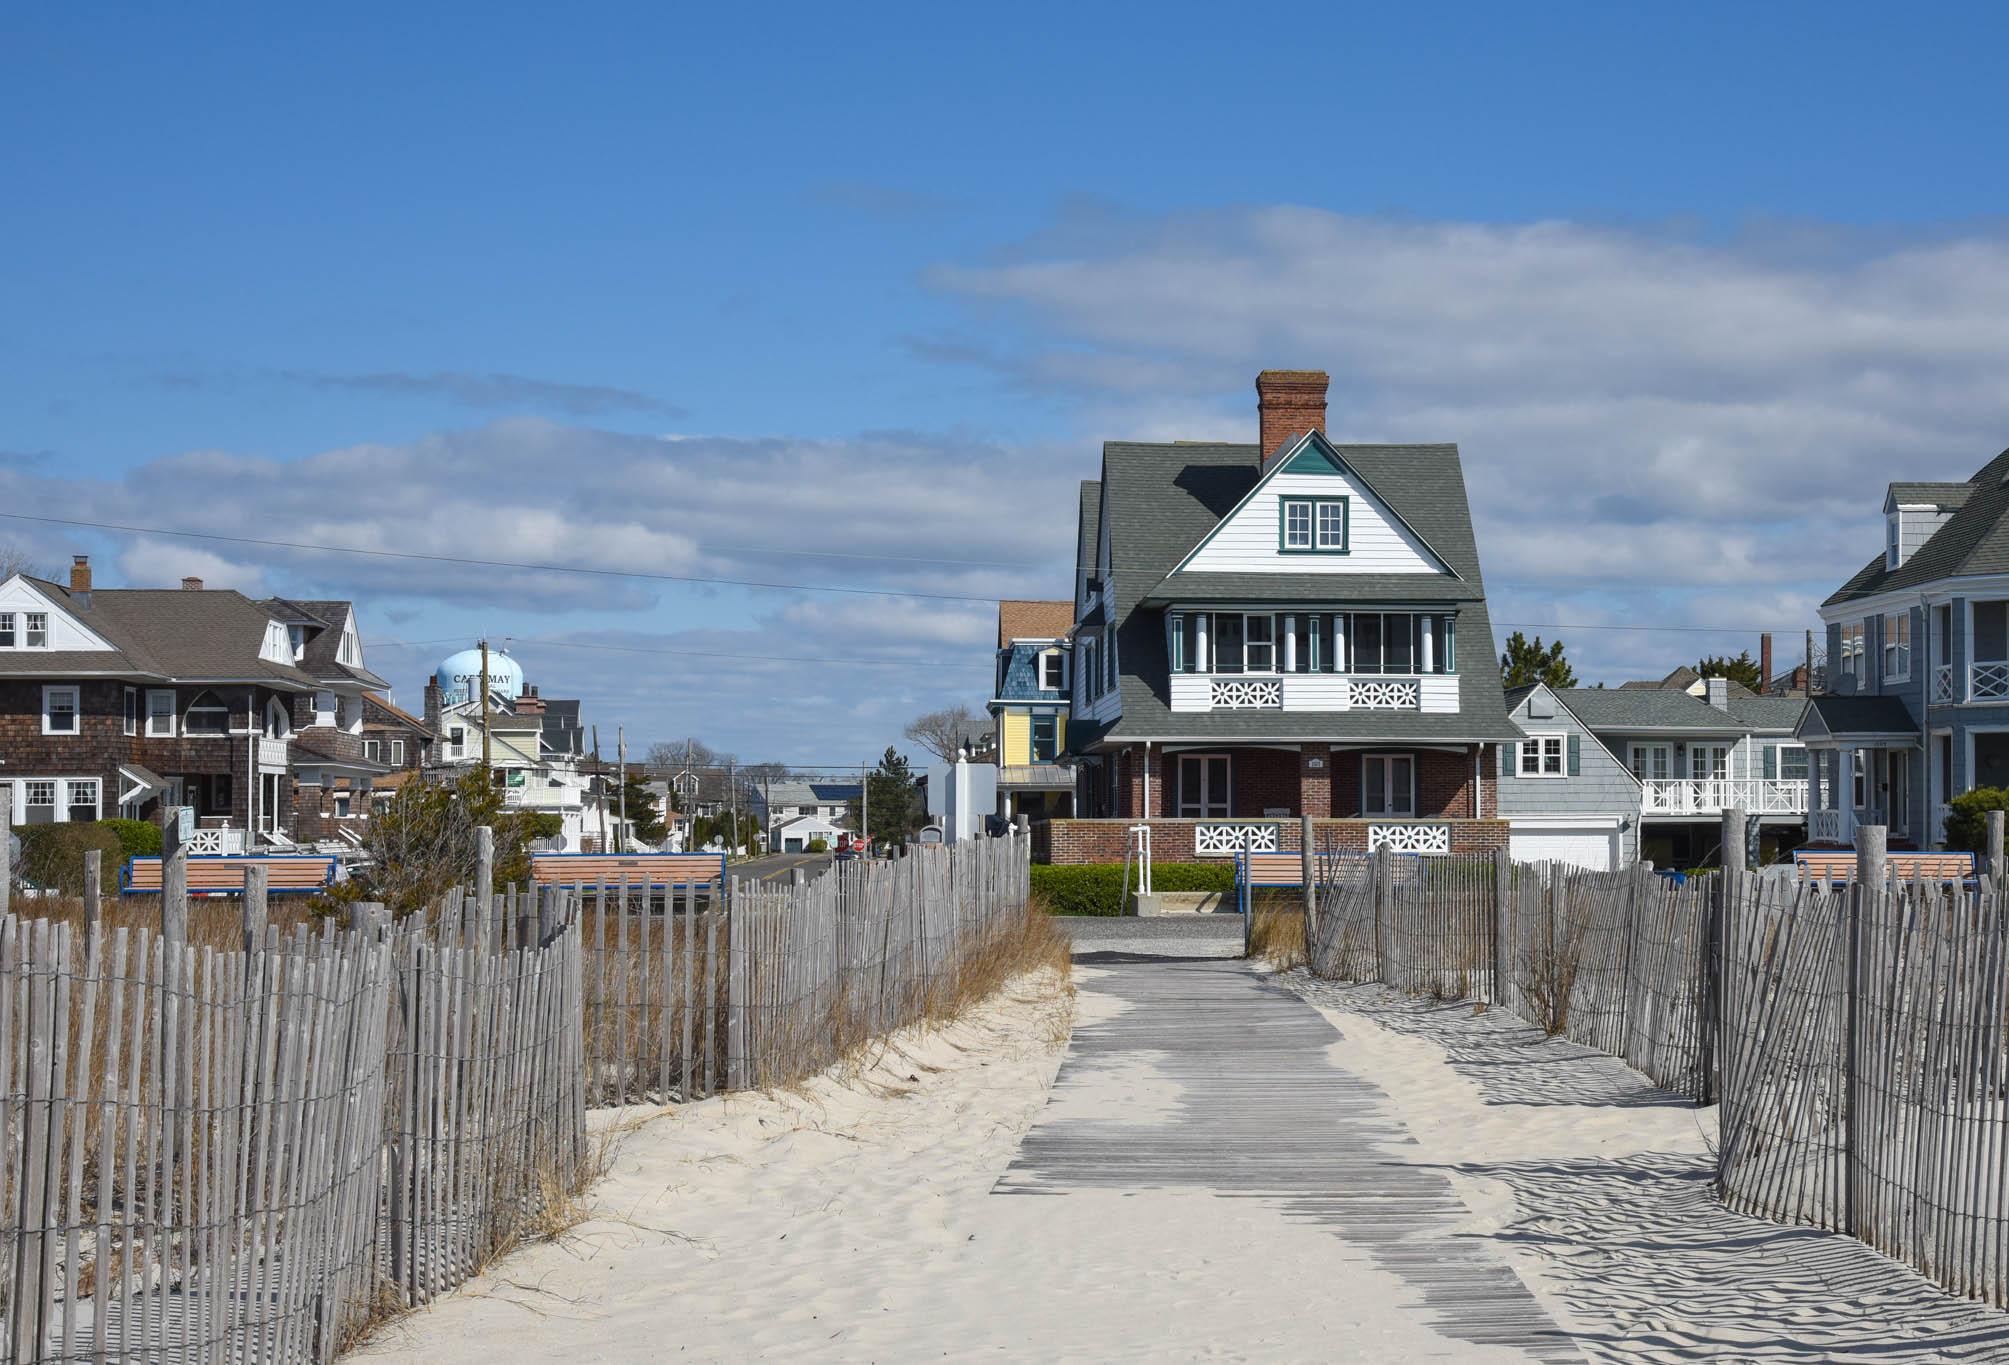 Looking at the beach walking path